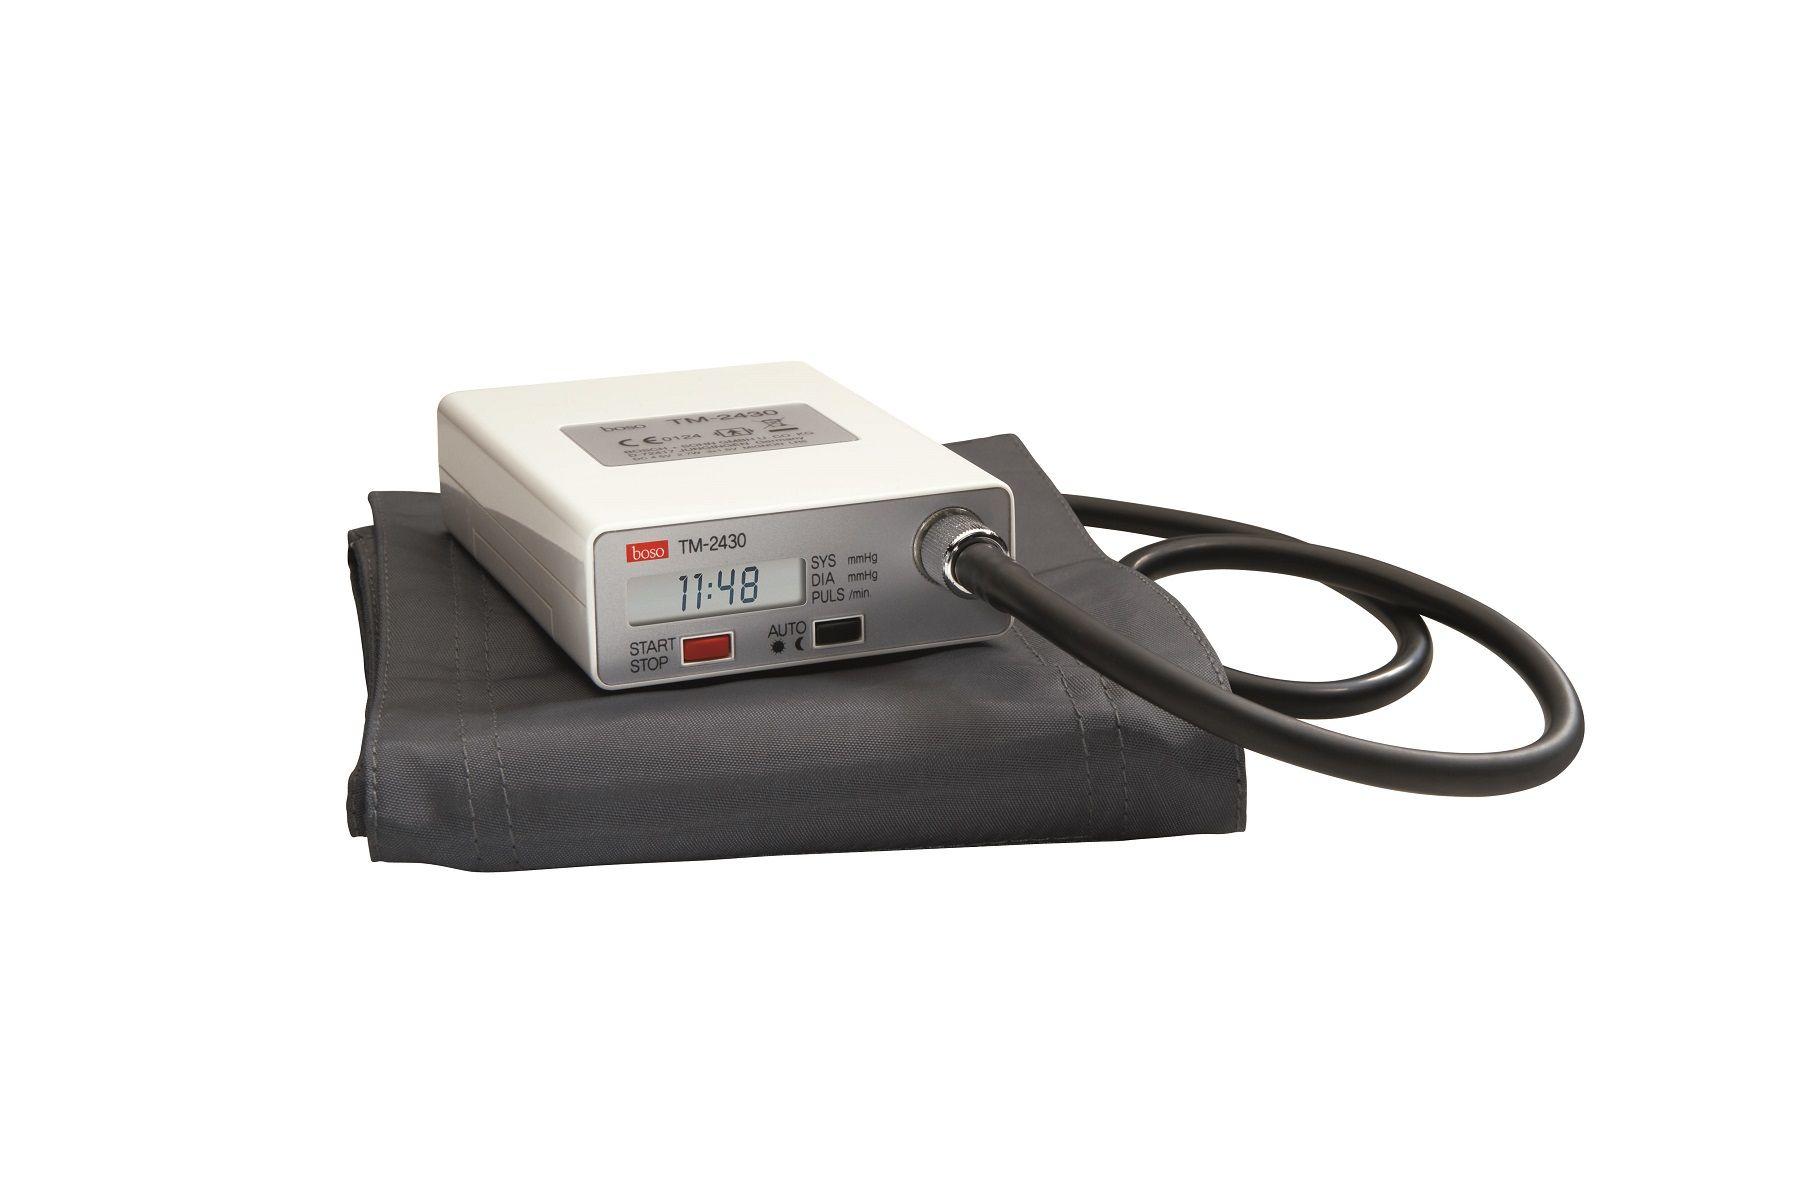 slide image Aktionspaket: Langzeit-Blutdruckmesser boso TM-2430 PC 2